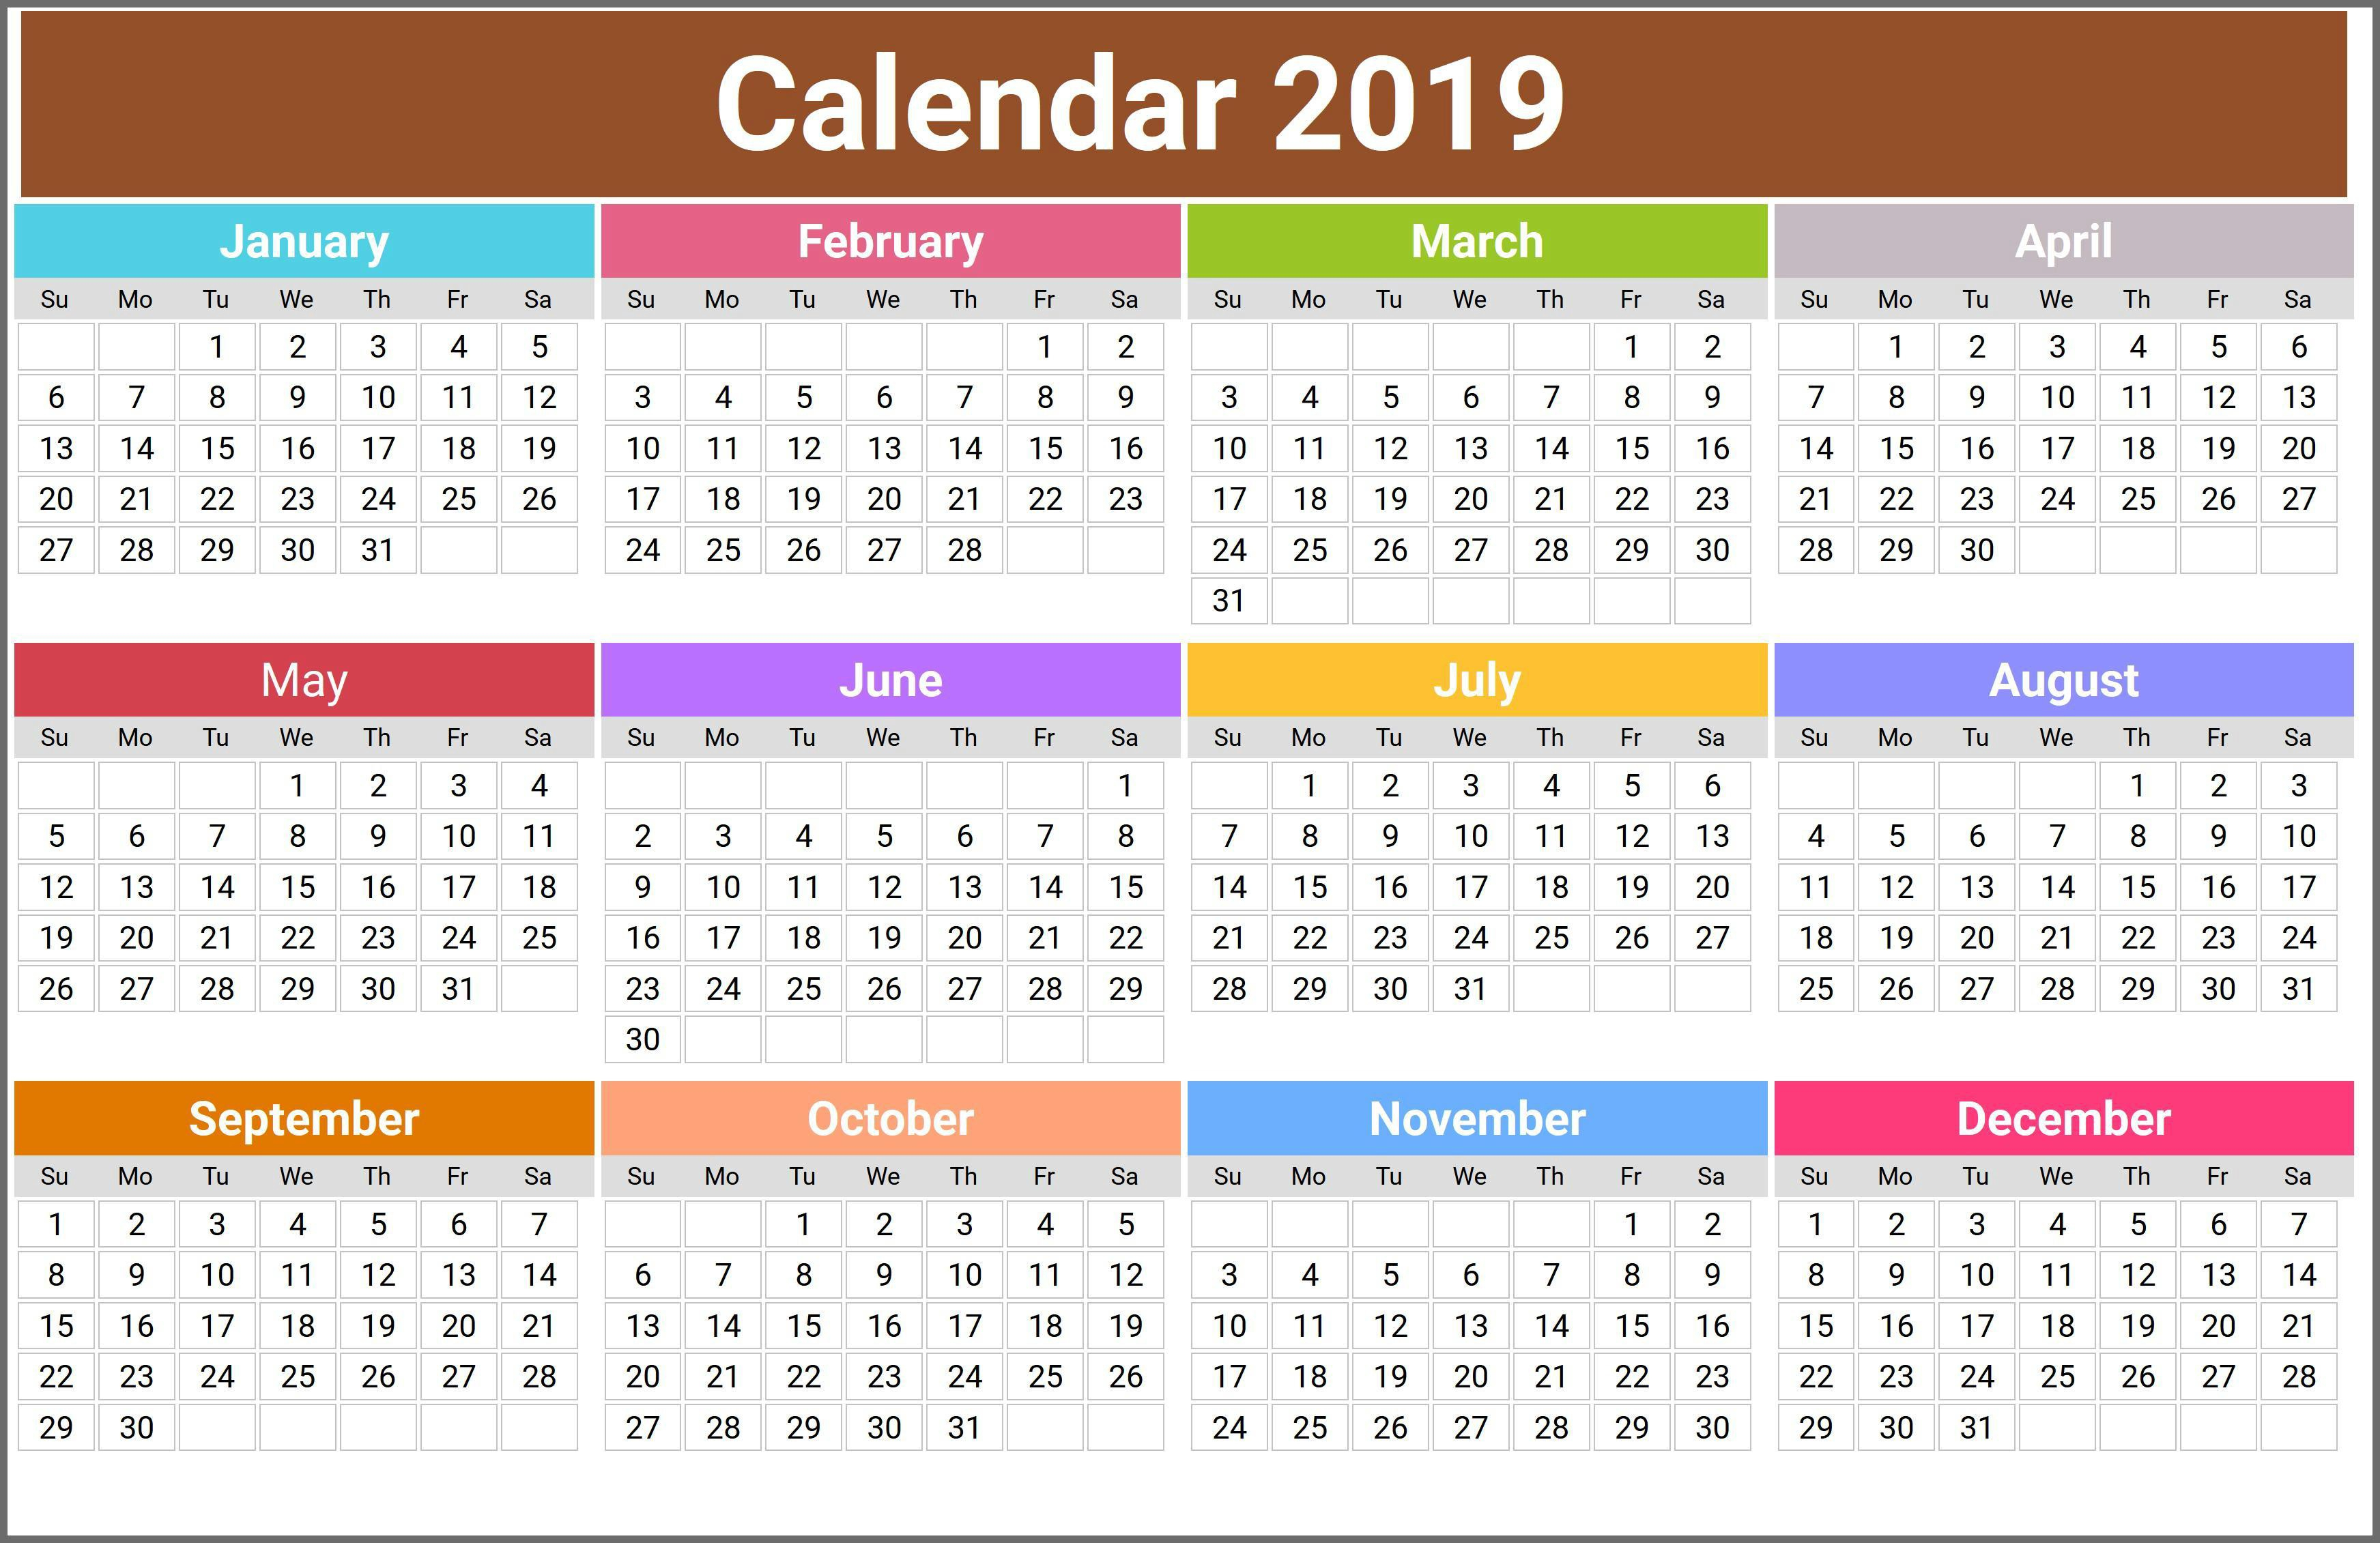 Free Printable Calendar 2019 : Usa, Uk, India, Canada with regard to Max 30 Calendar Pdf